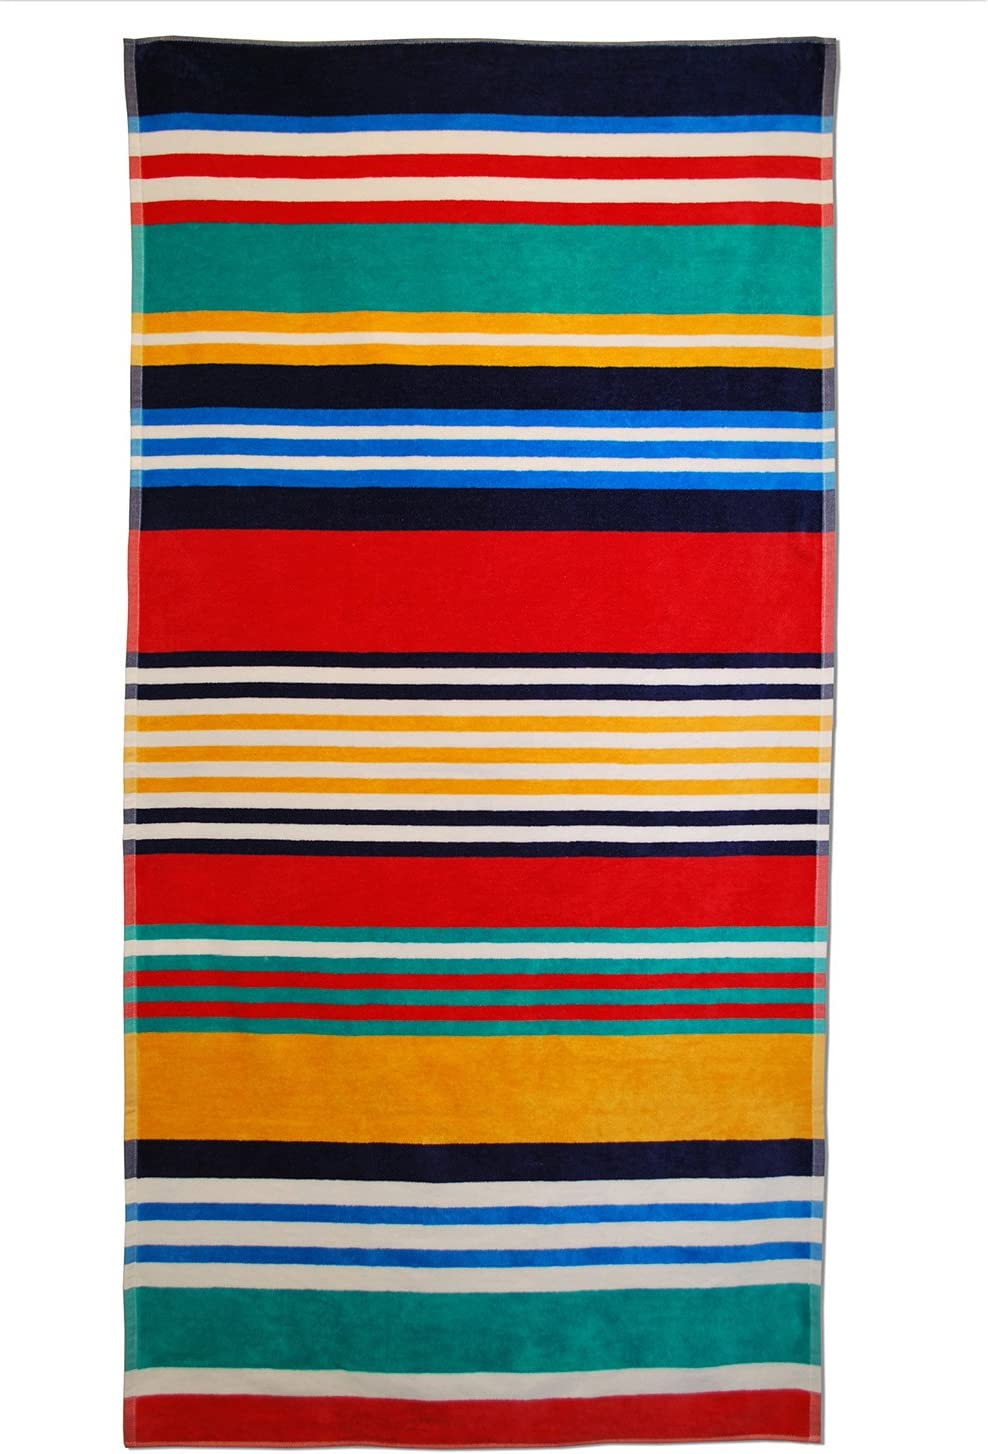 "SUPERIOR 100% Cotton Luxury Beach Towels - Oversized Beach Towel, 450 GSM Swim Towel, Multicolor Stripes (34"" x 64"")"